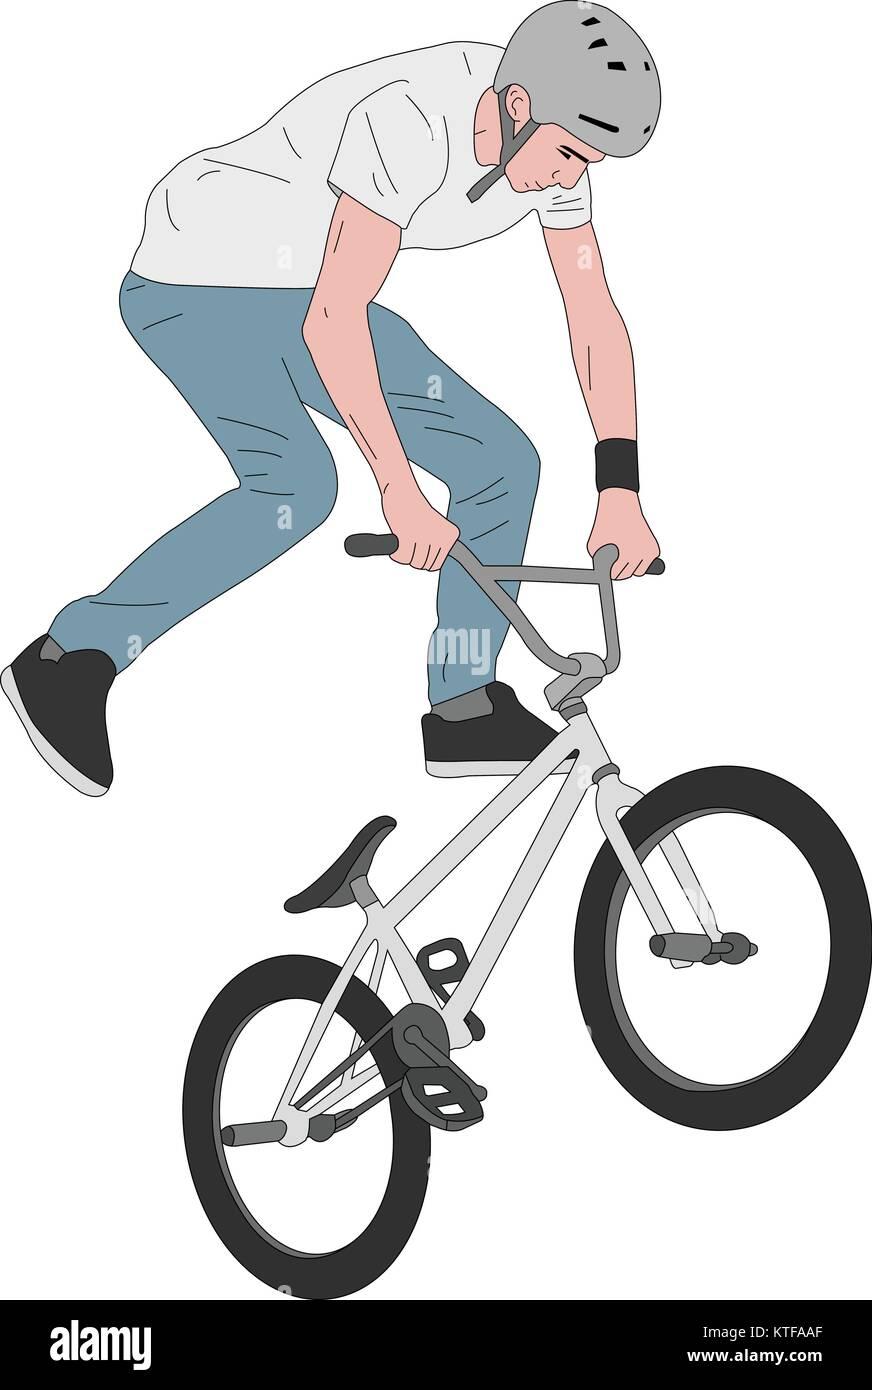 bmx stunt bicyclist illustration - vector - Stock Vector